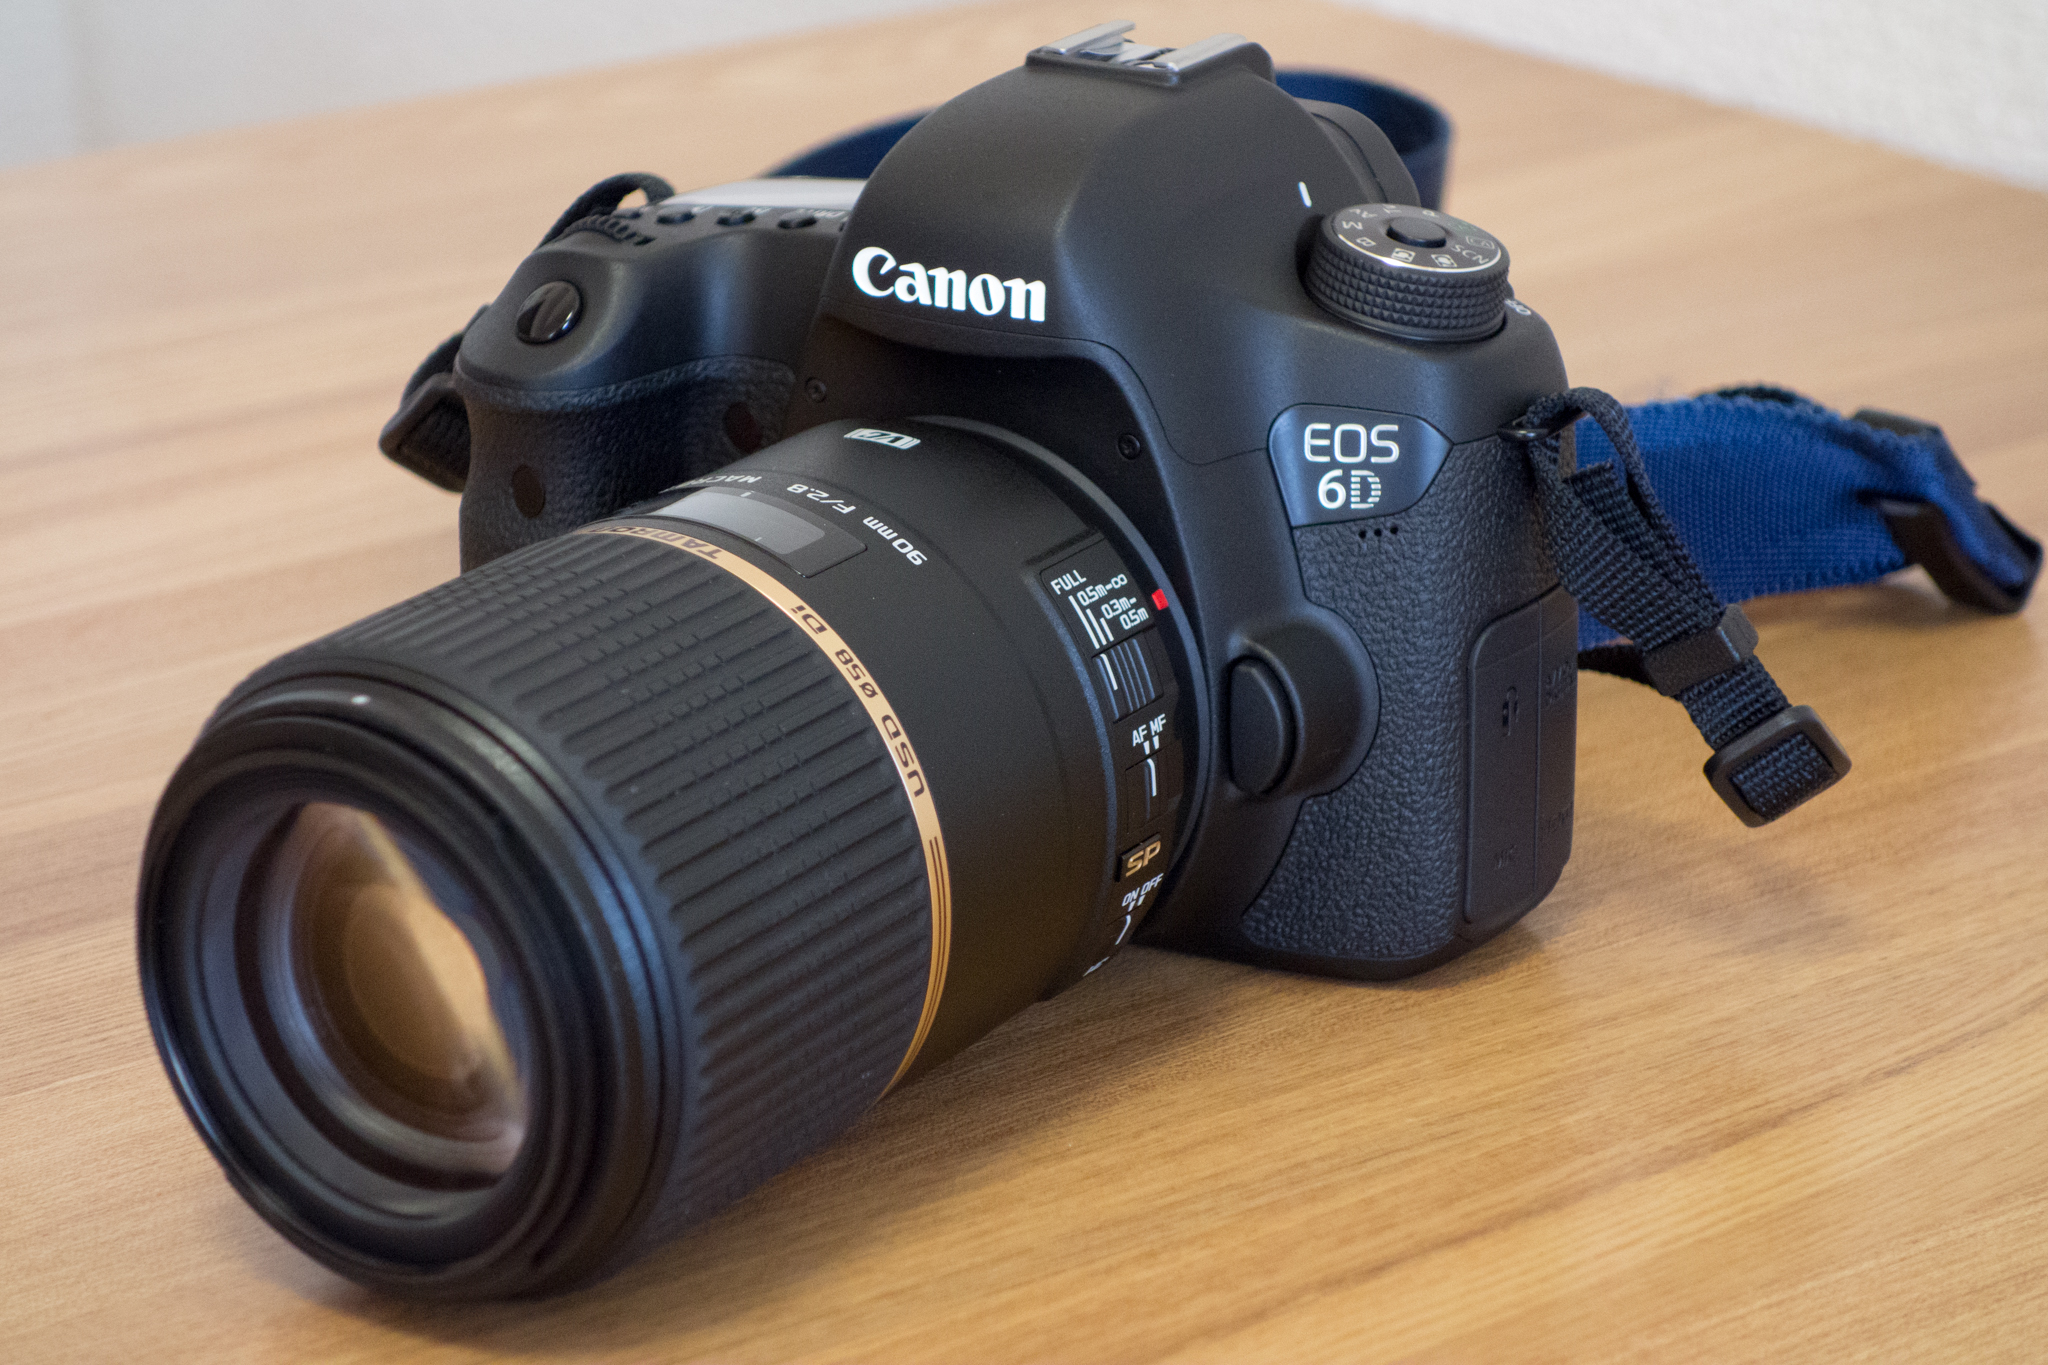 Tapa de objetivo 58 mm Lens Cap para Tamron SP 90 mm F//2.8 Di Macro 1:1 VC USD